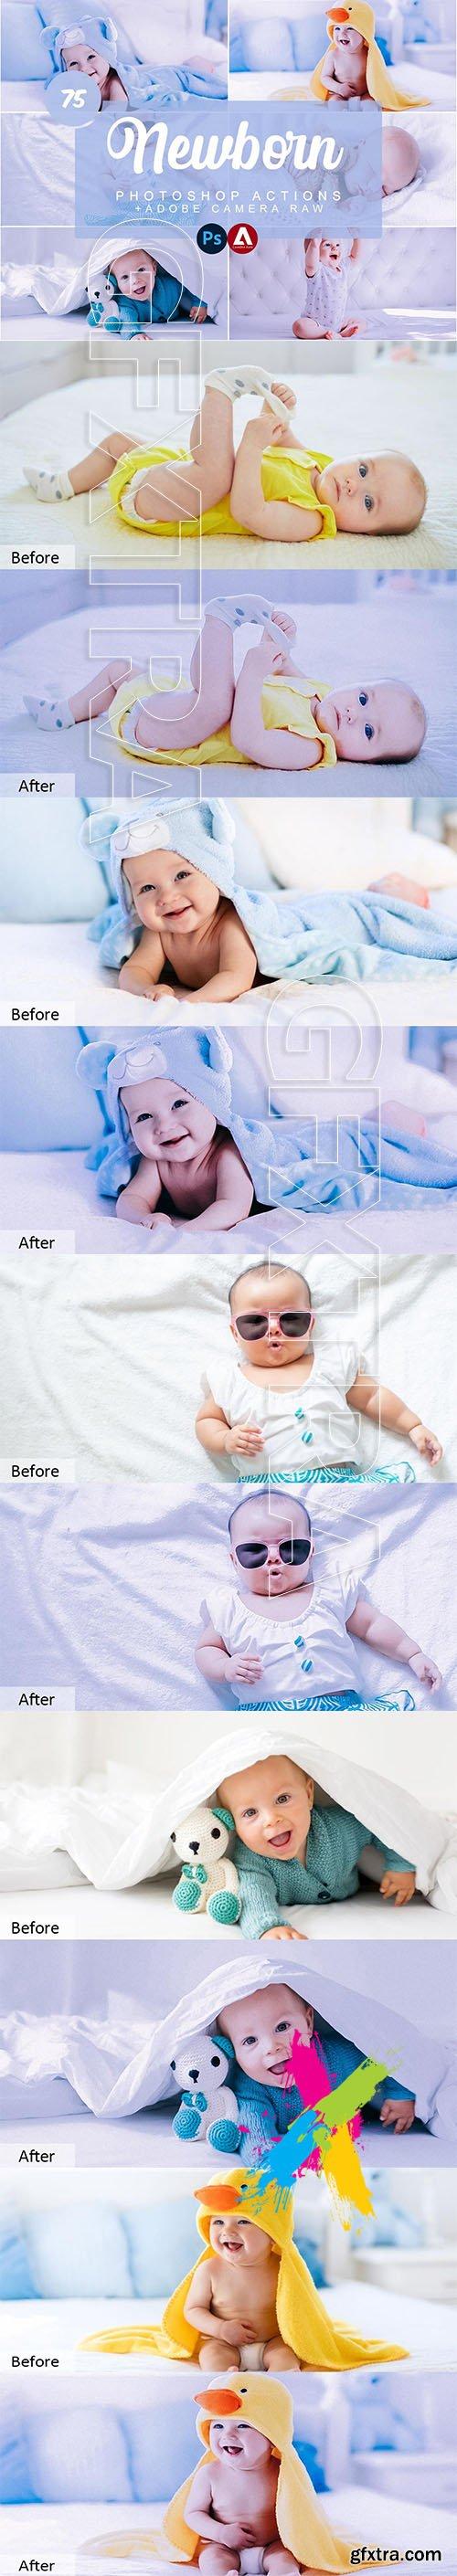 CreativeMarket - Newborn Photoshop Actions 5733429